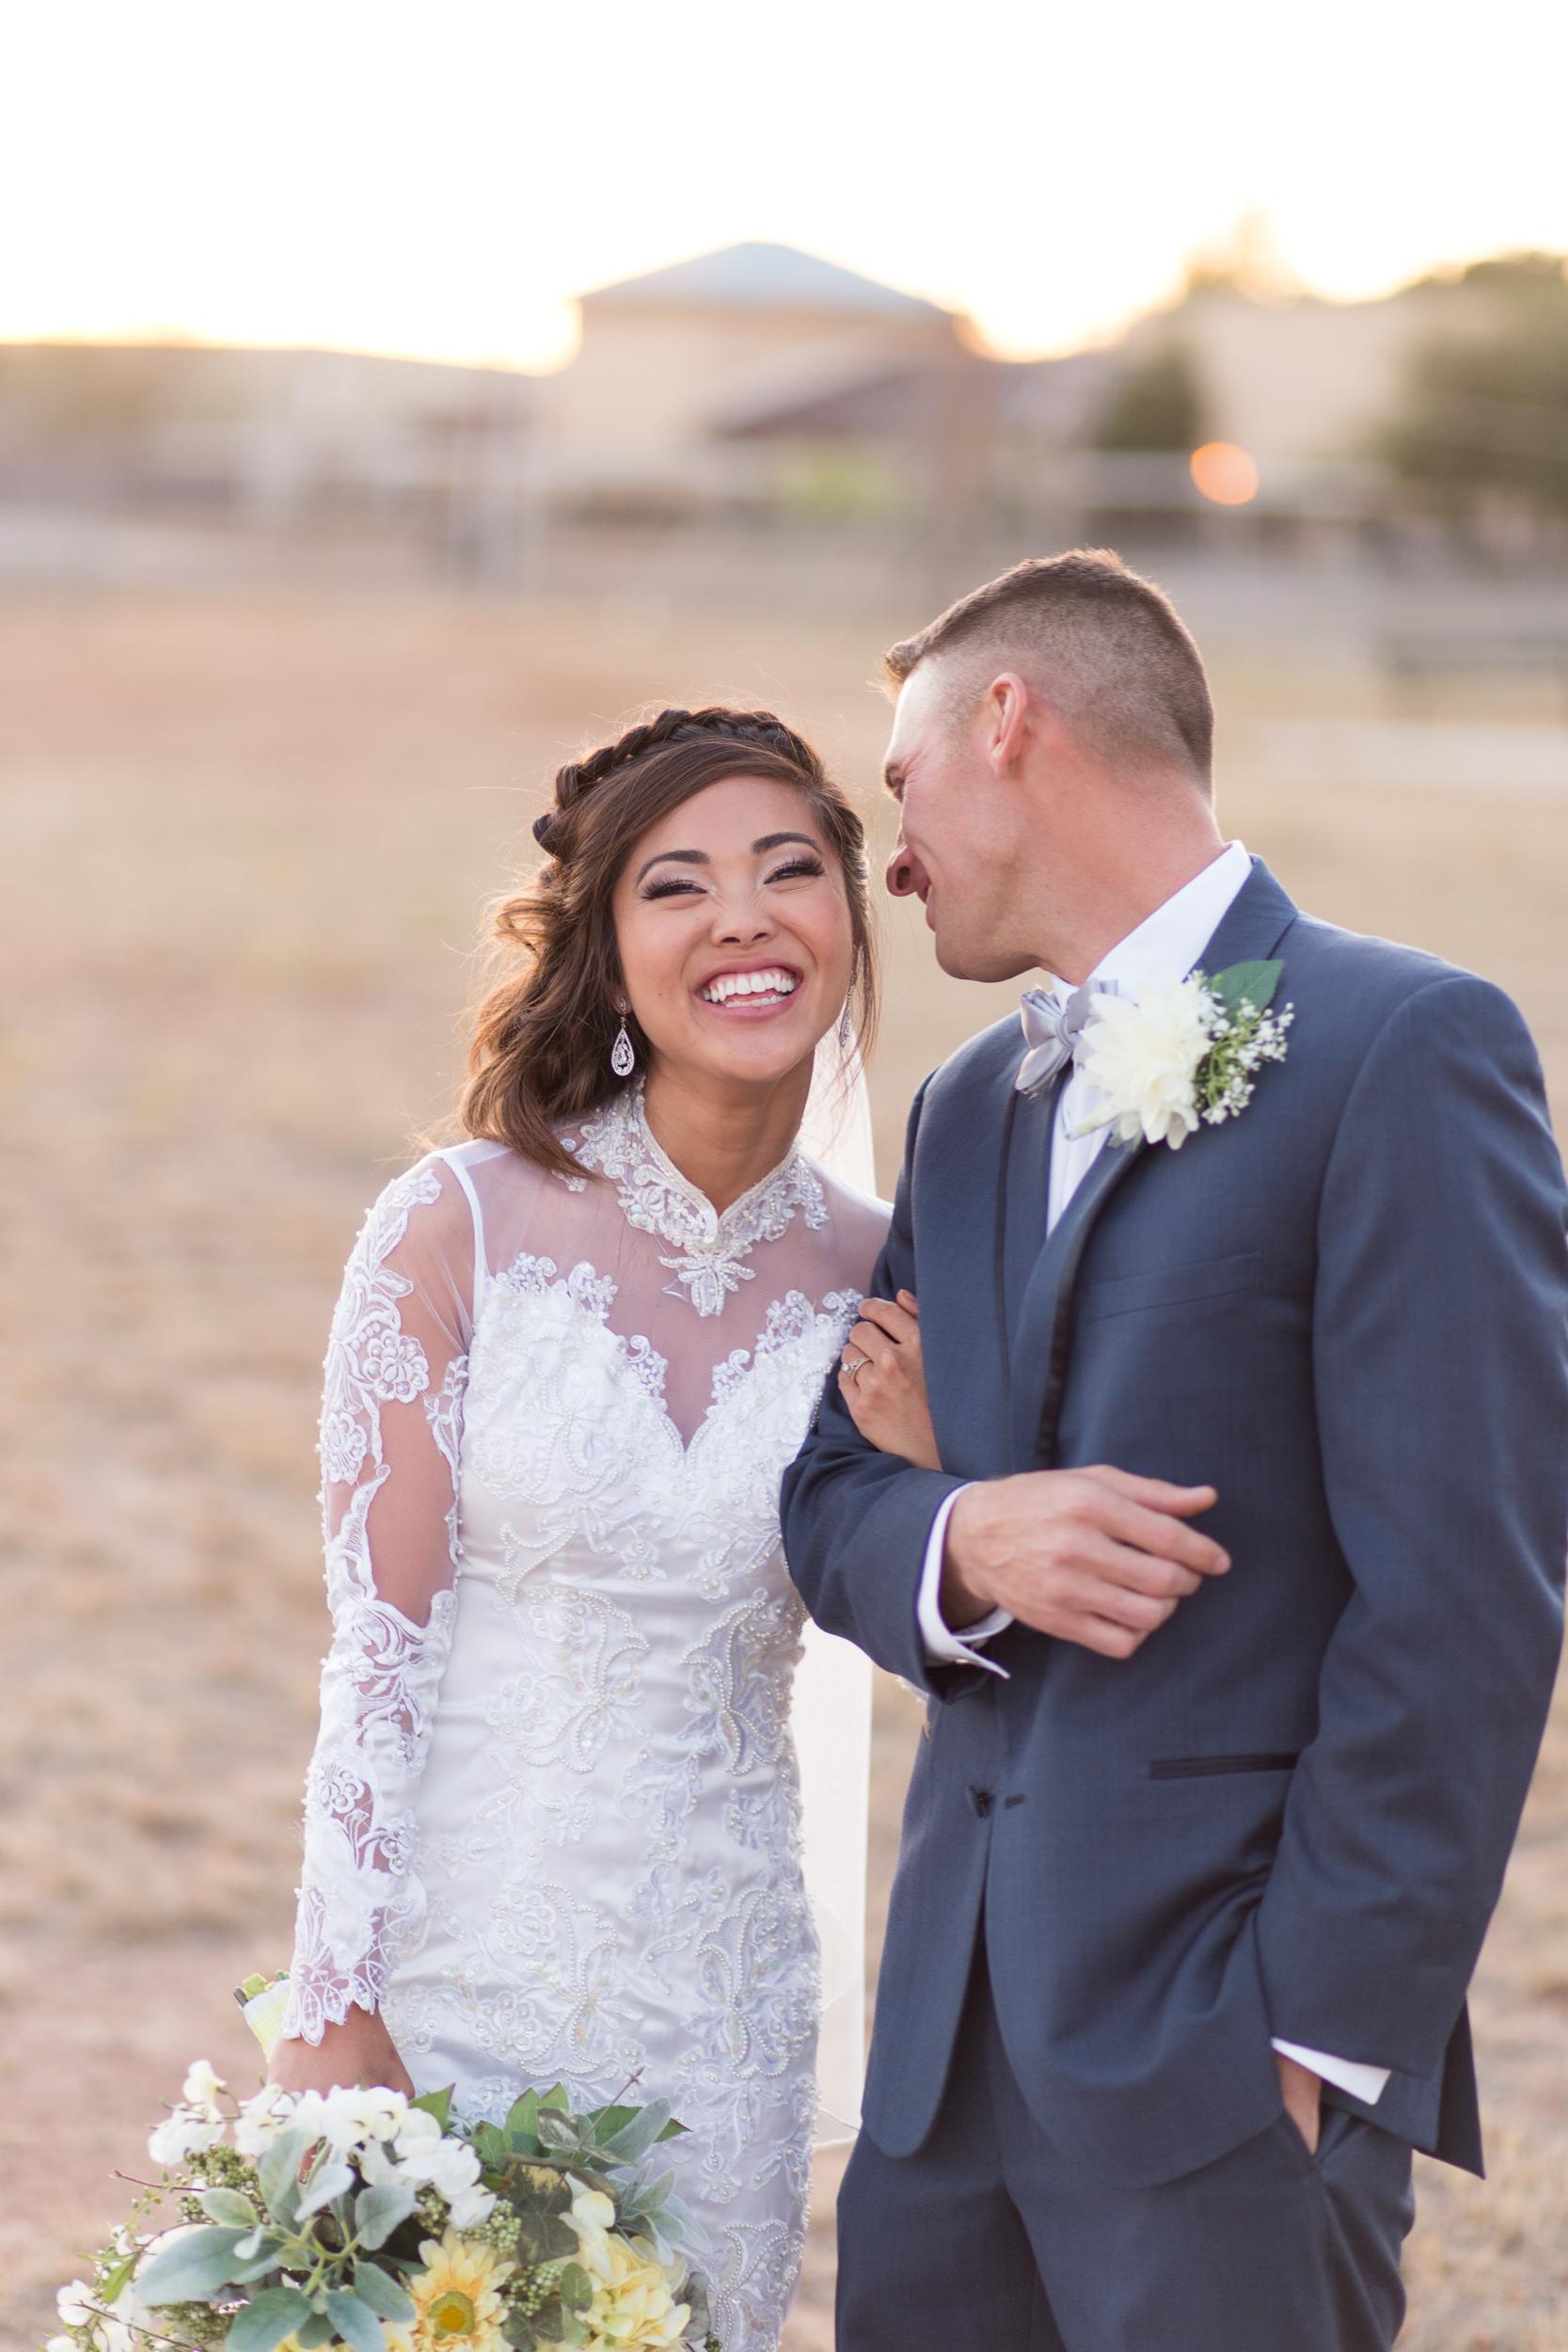 hall_wedding blog_kelsie hendricks photography_odessa_ west texas-90.jpg